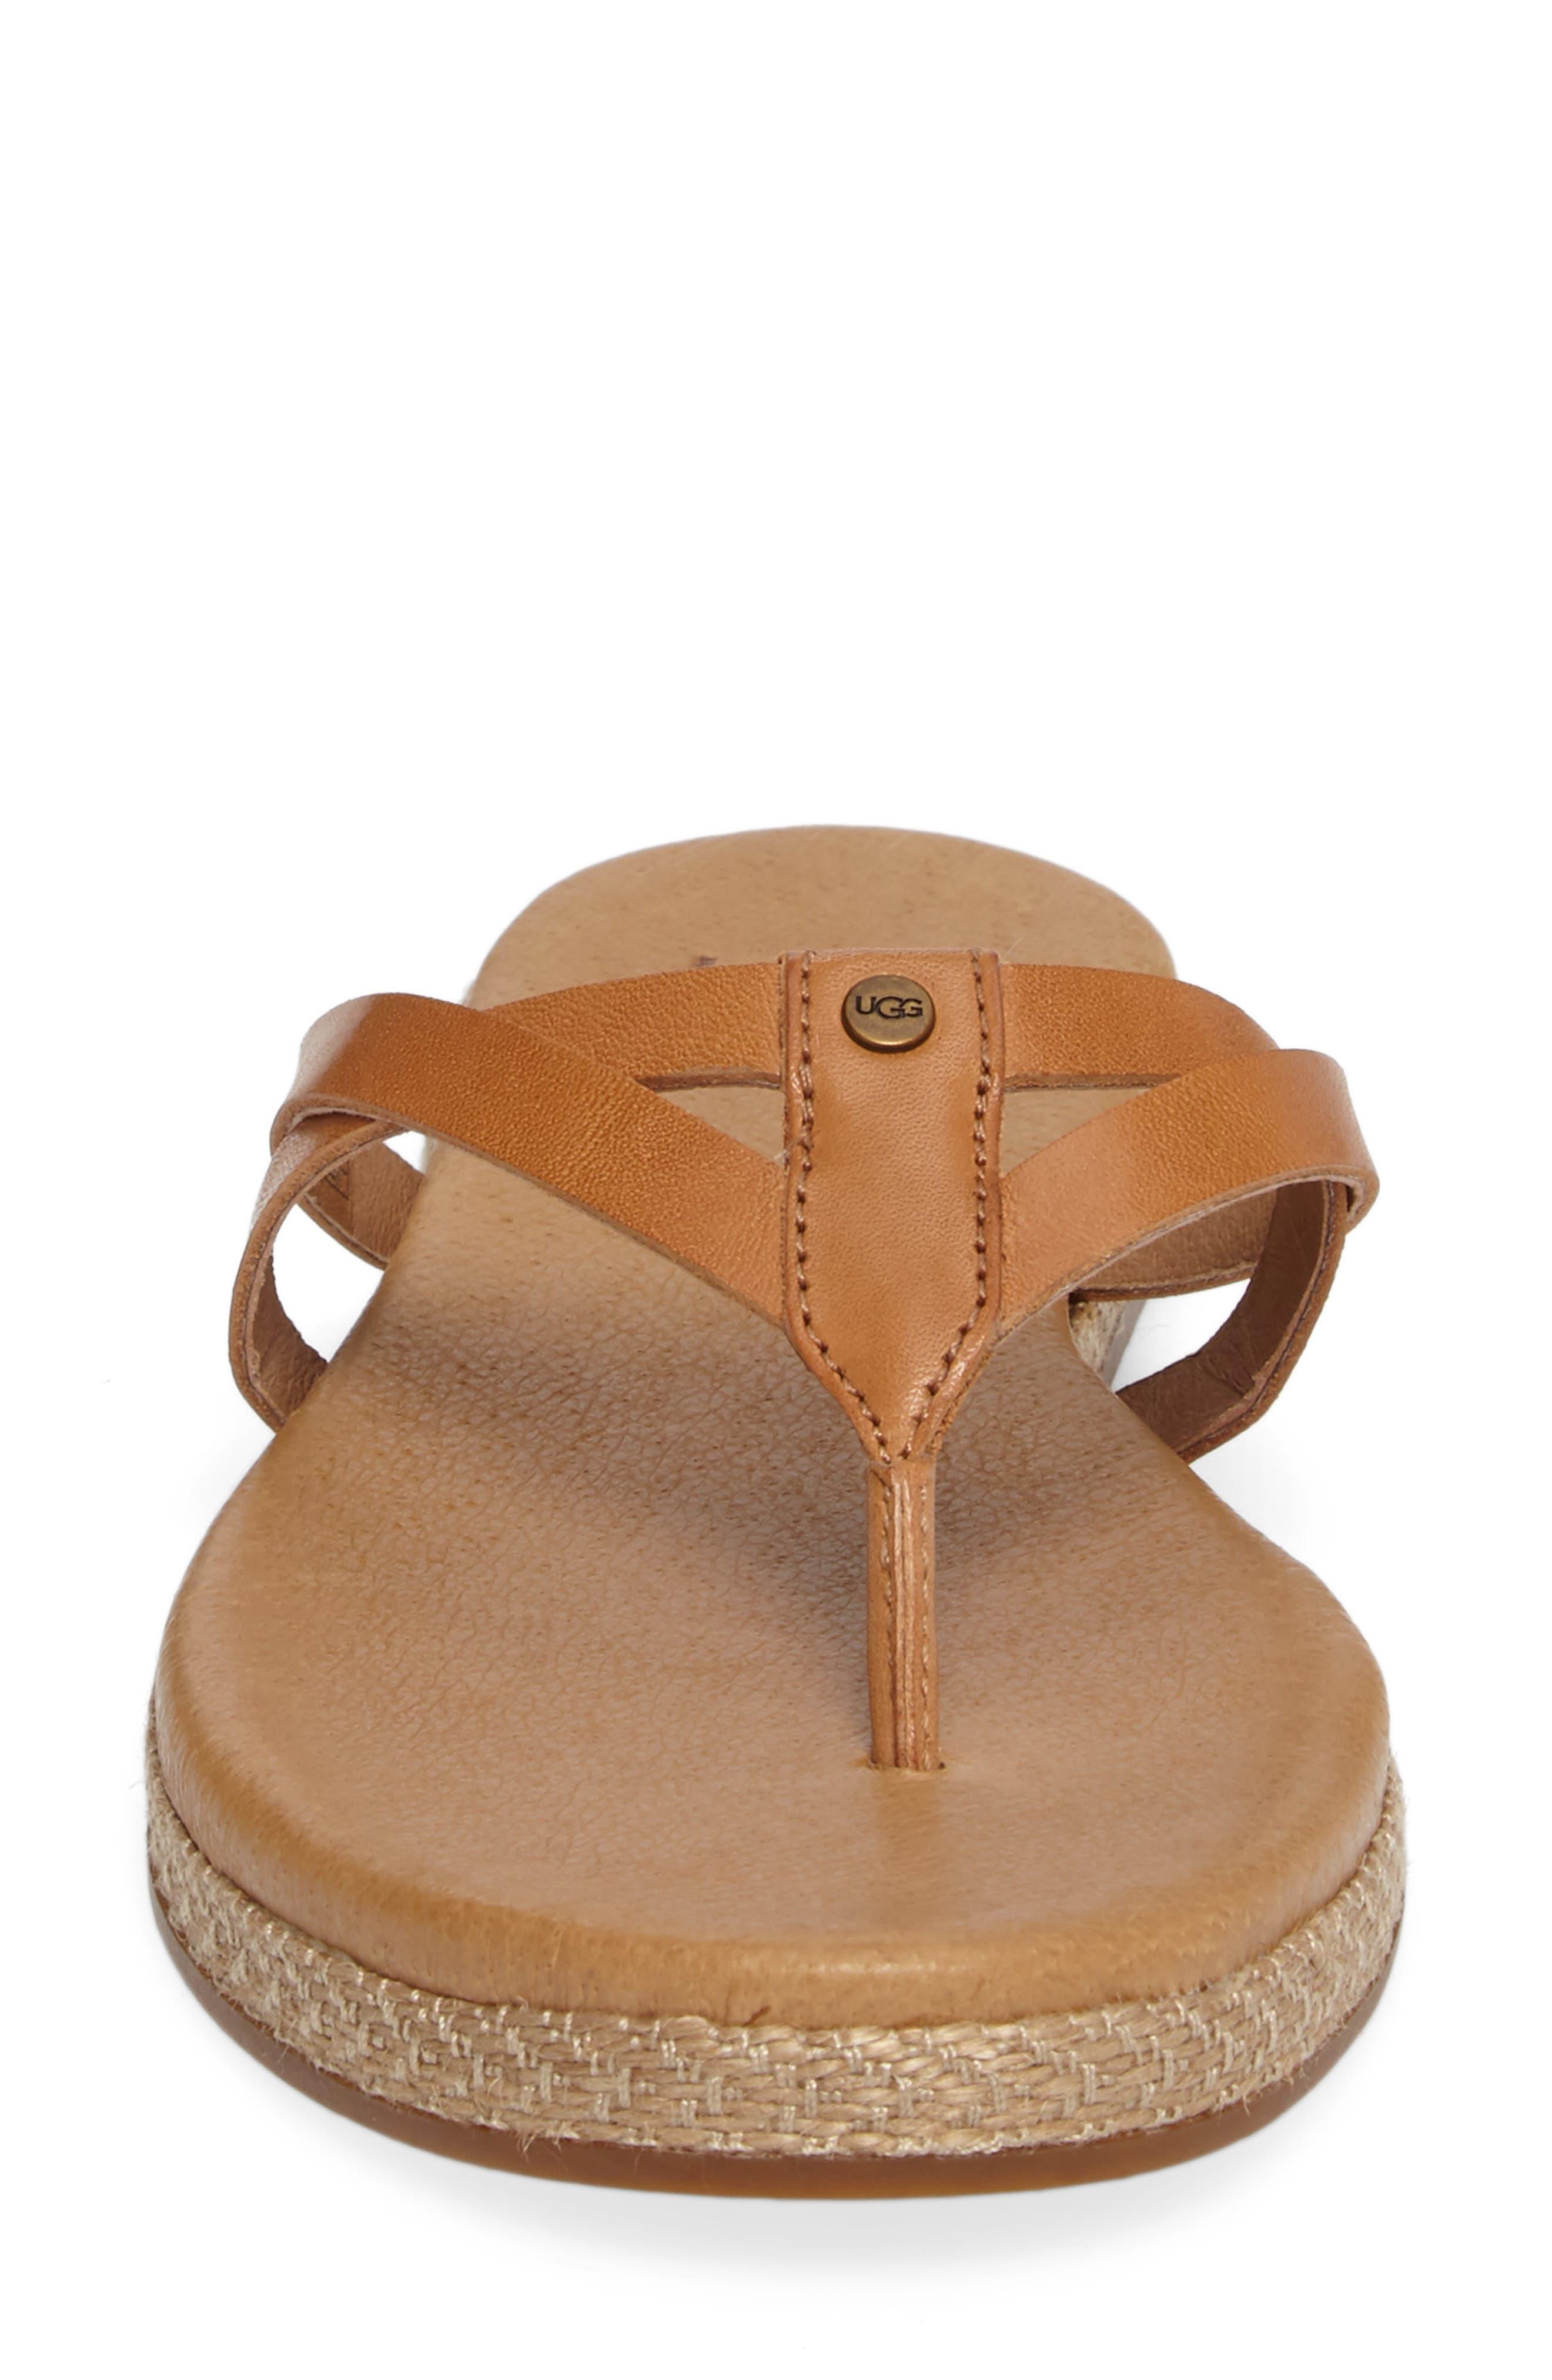 Annice Flip Flop,                             Alternate thumbnail 4, color,                             Cafe Leather